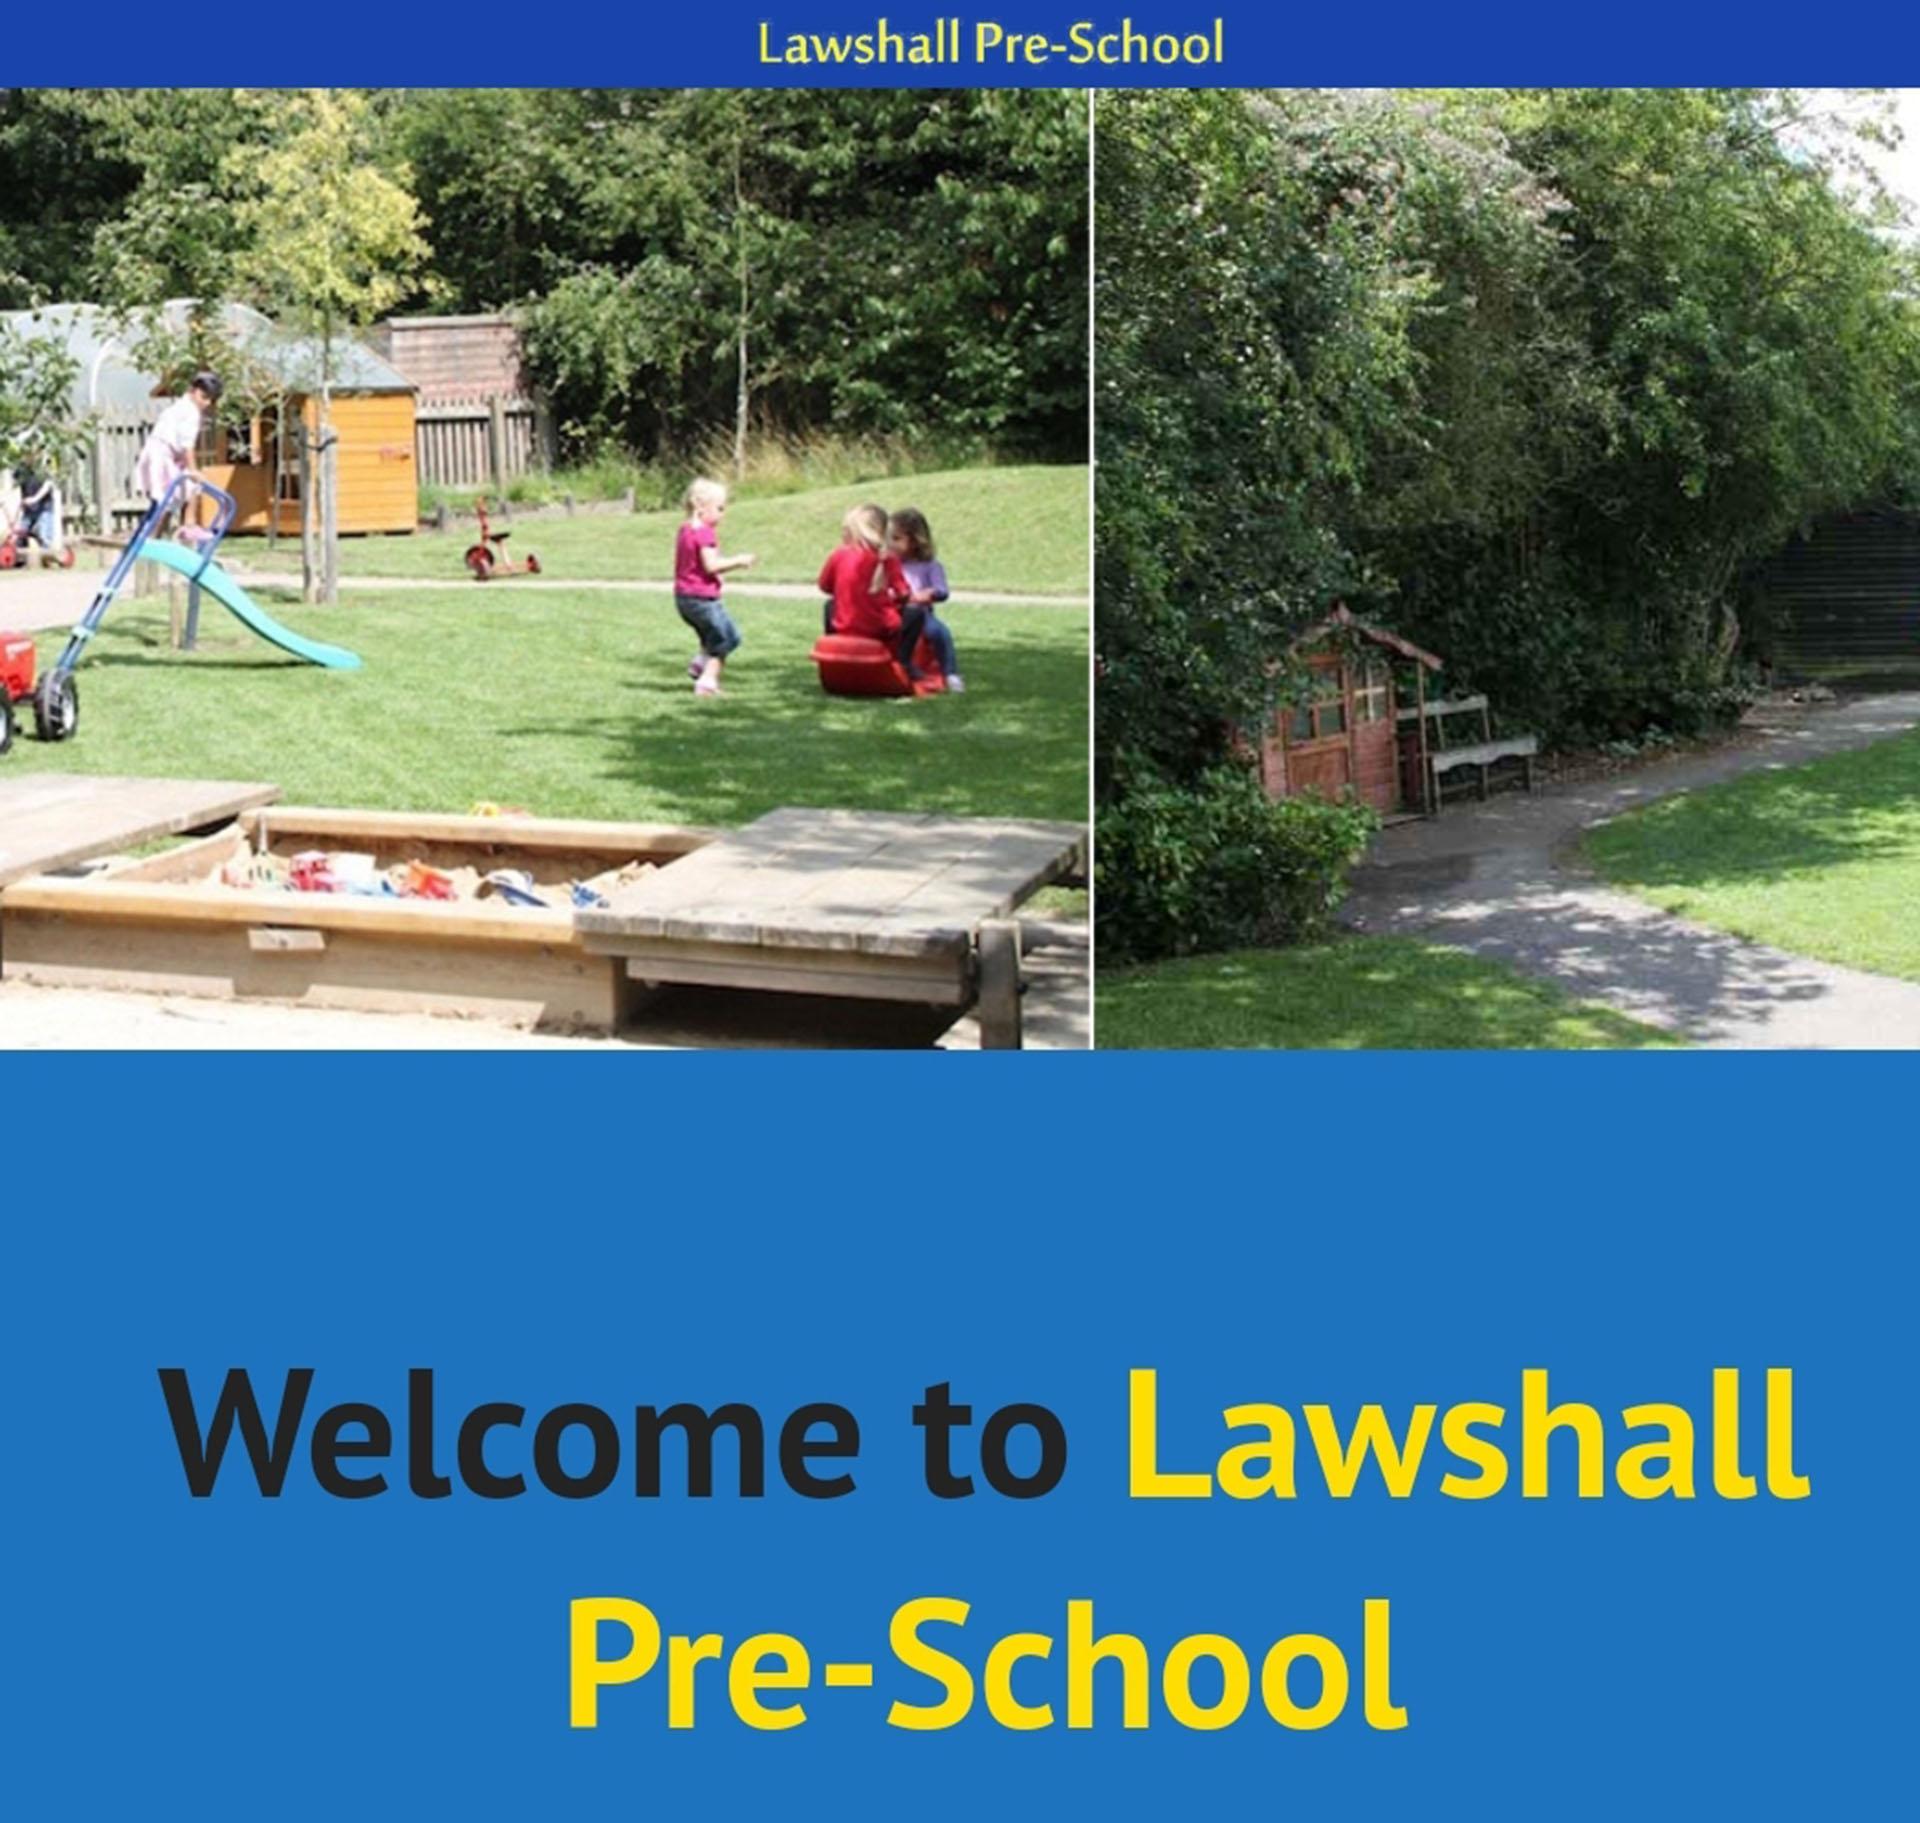 Lawshall Pre-School 's logo